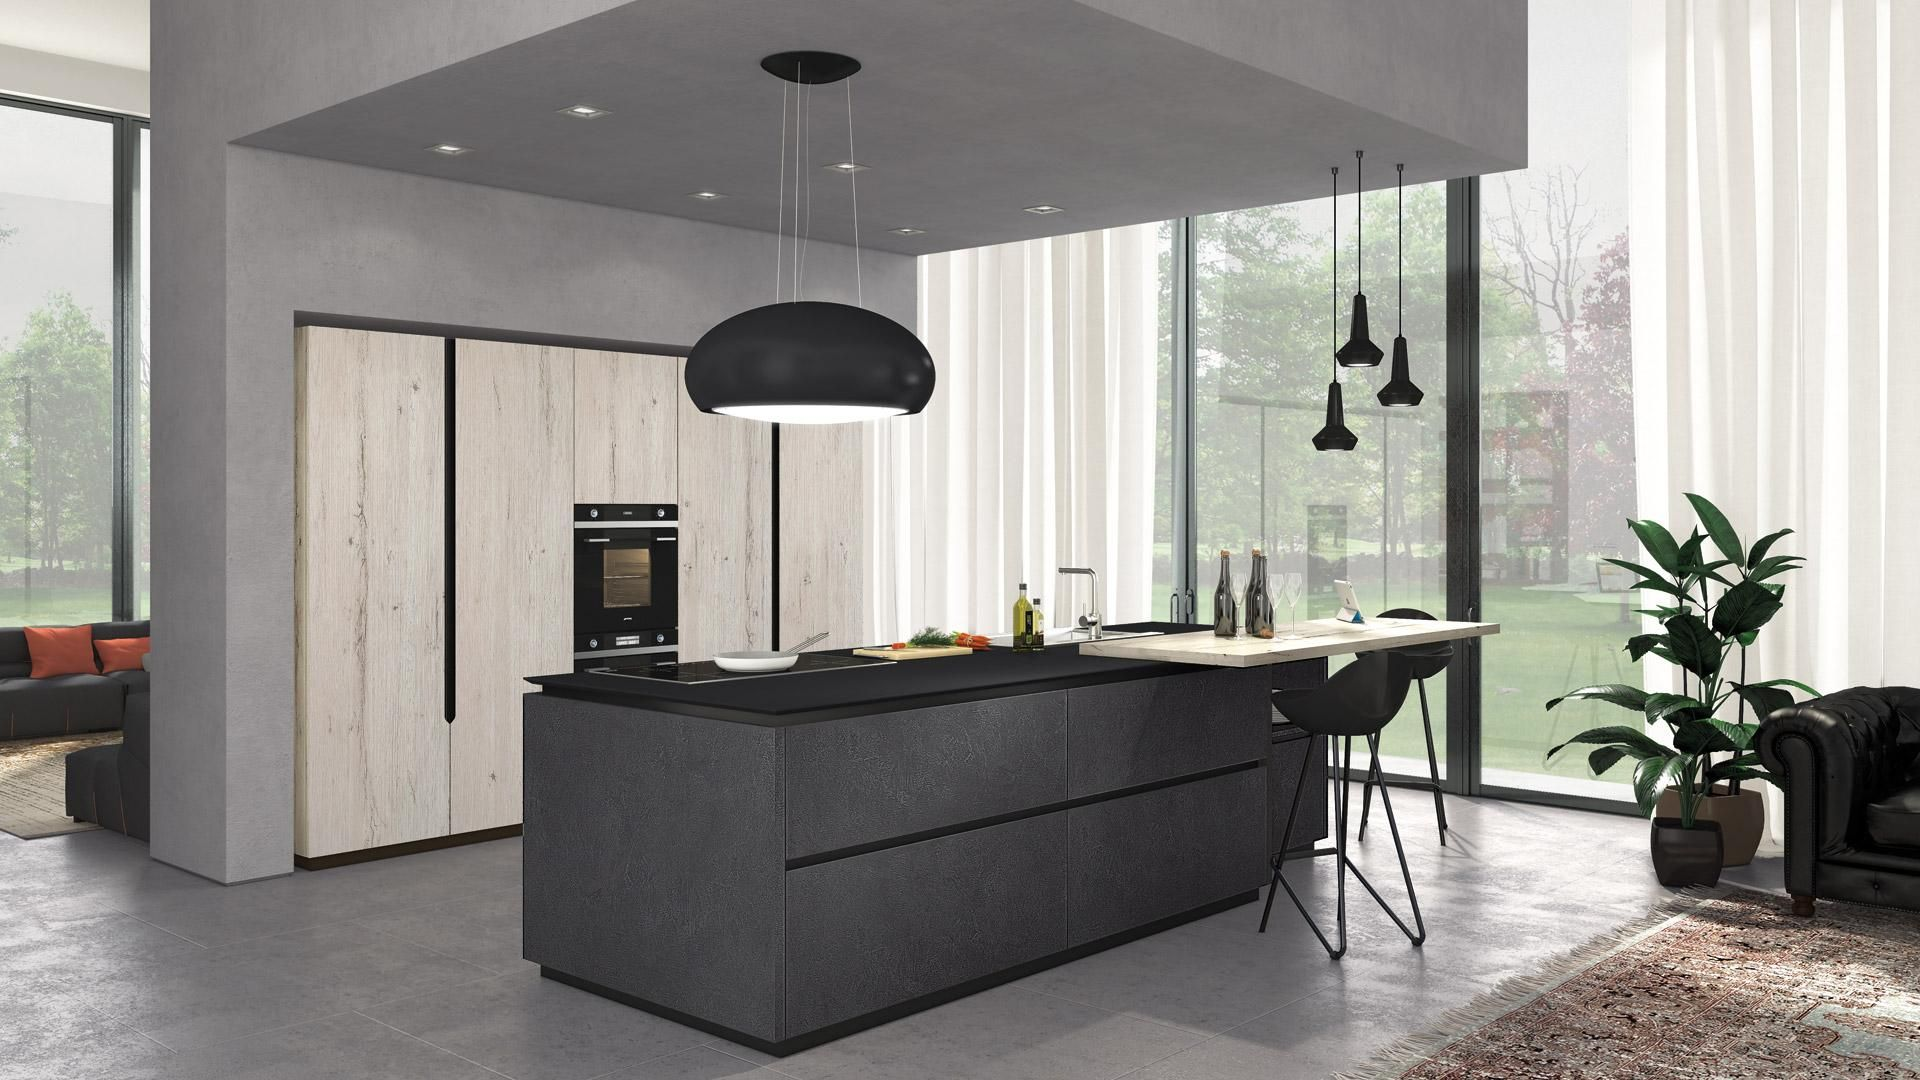 oltre - cucine moderne - cucine lube | cucina | pinterest | kitchens - Arredo Bagno Lube